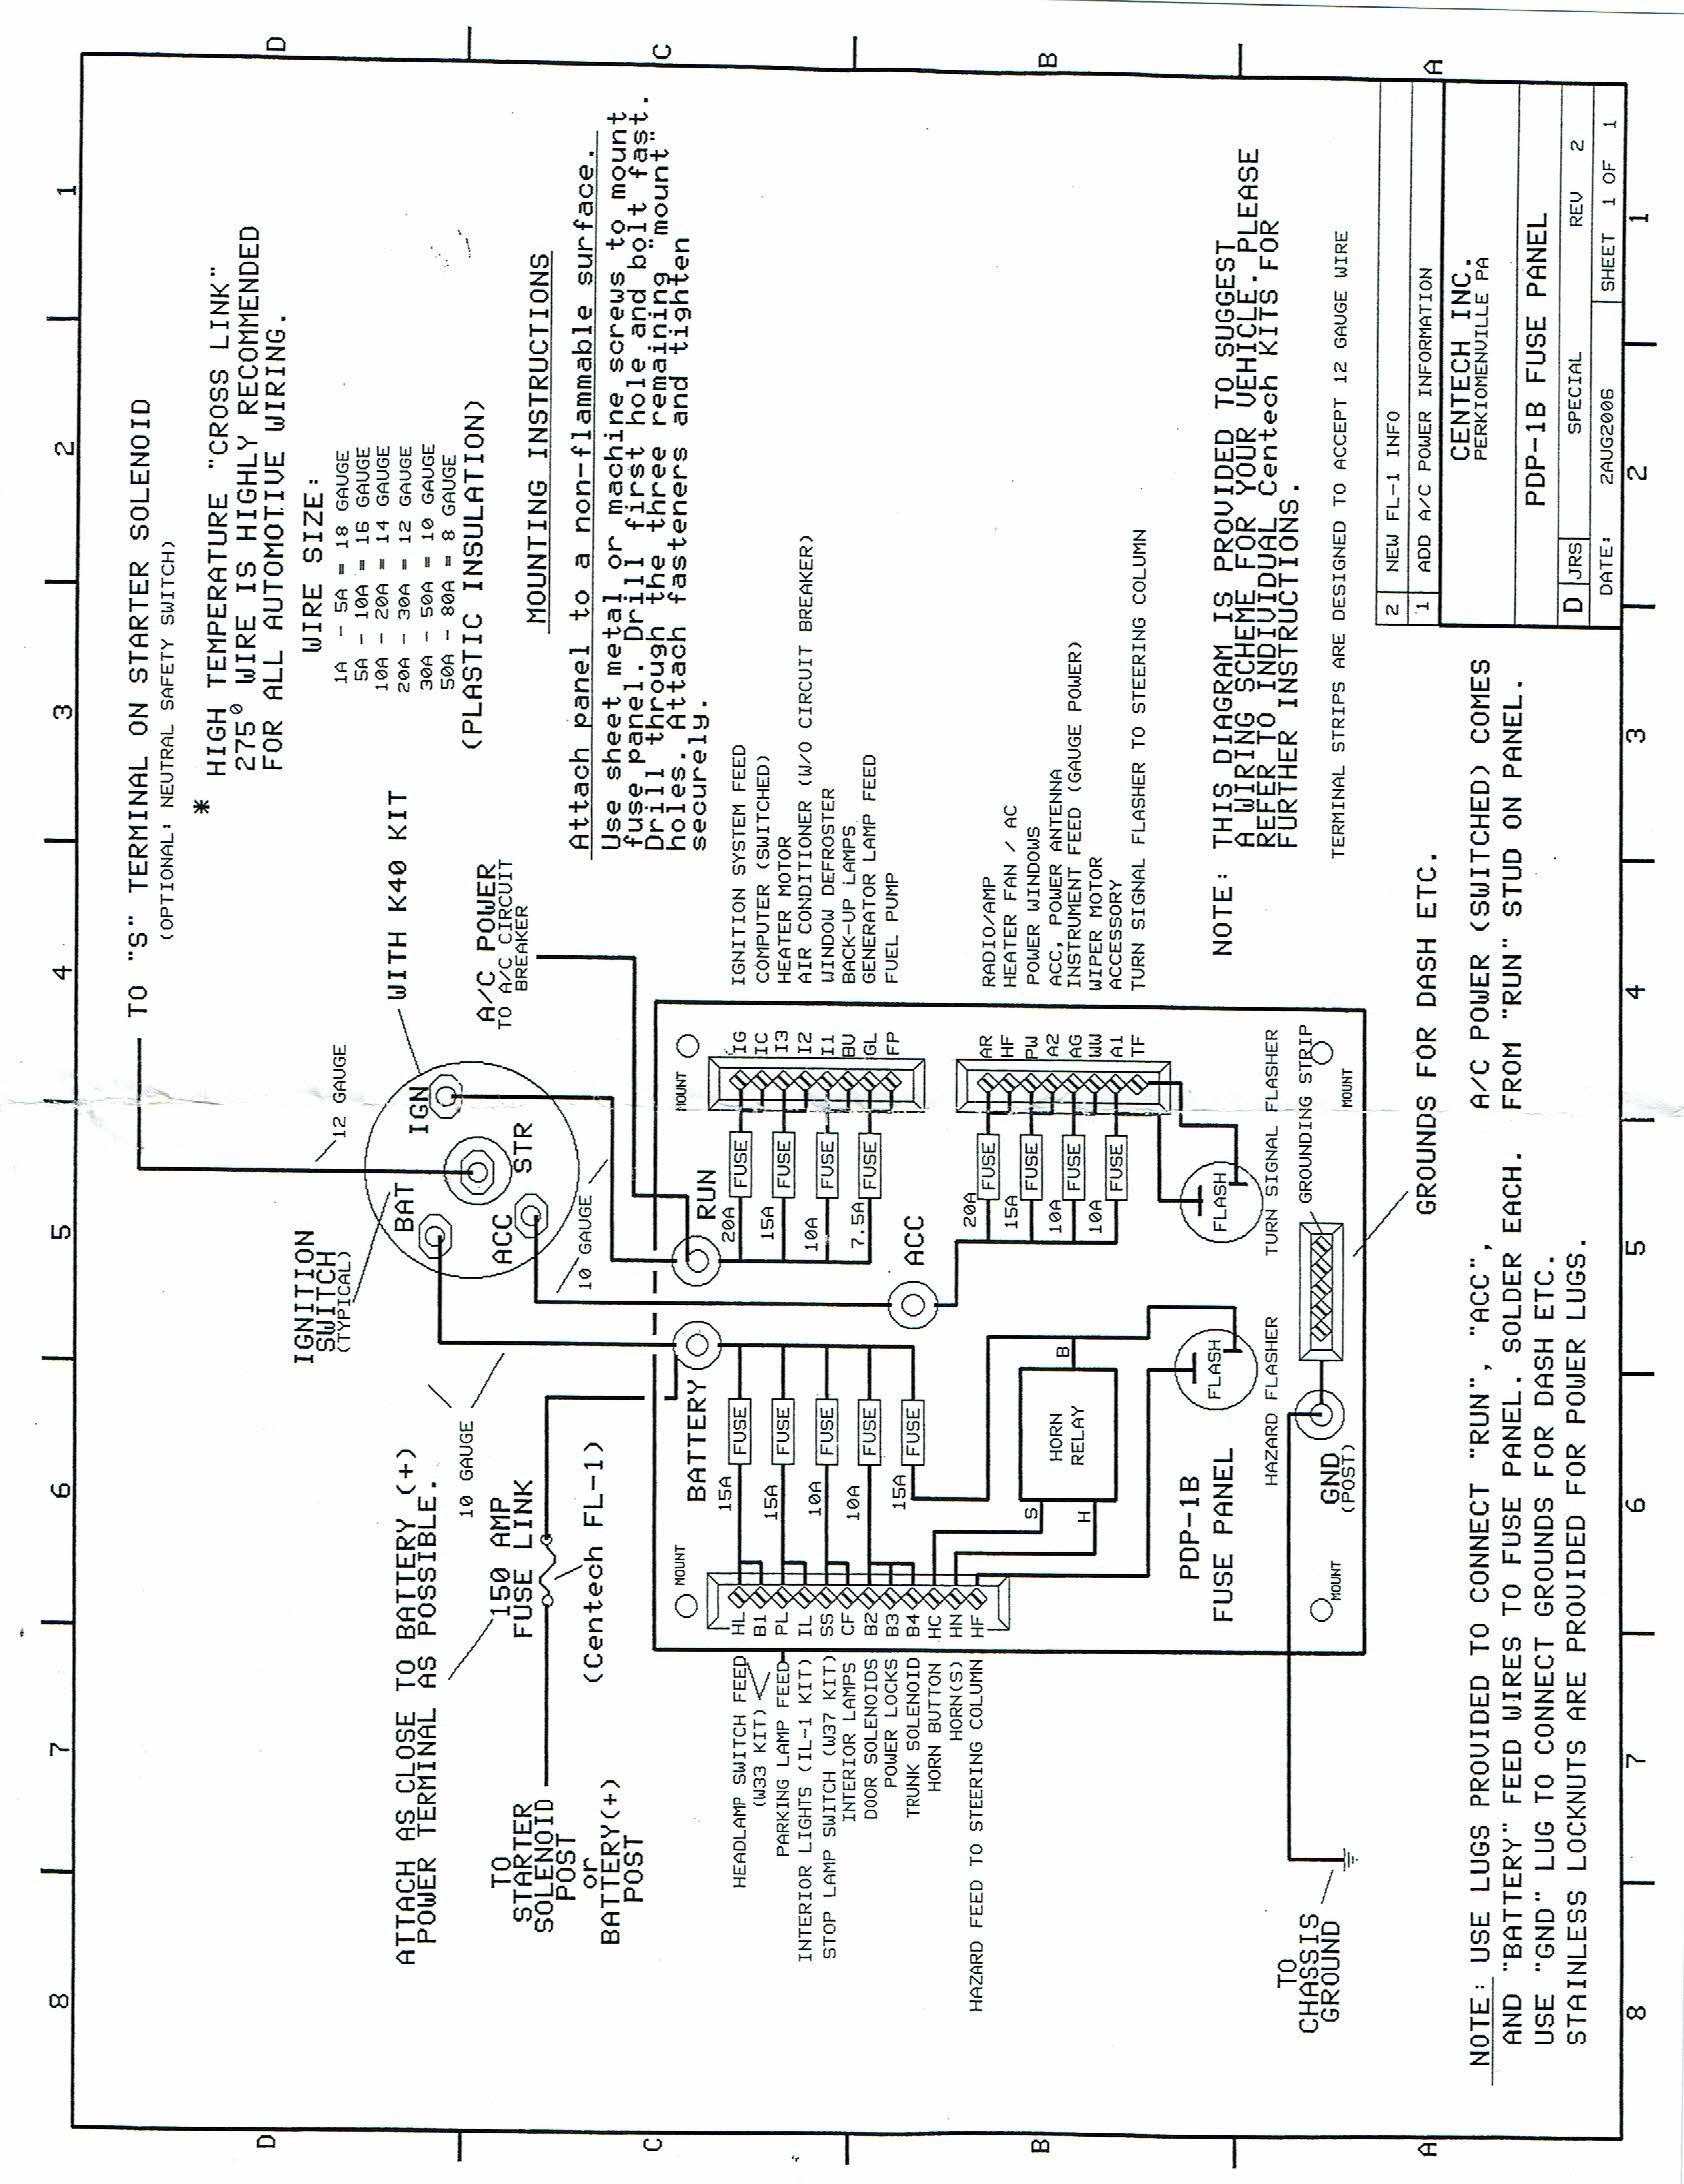 [ZSVE_7041]  Custom Fuse Panel for Dune Buggy, Sand Rail, Custom Car, Hot Rod, Kit Car | Hot Rod Fuse Panel Wiring Diagram |  | Carolina Dune Buggies